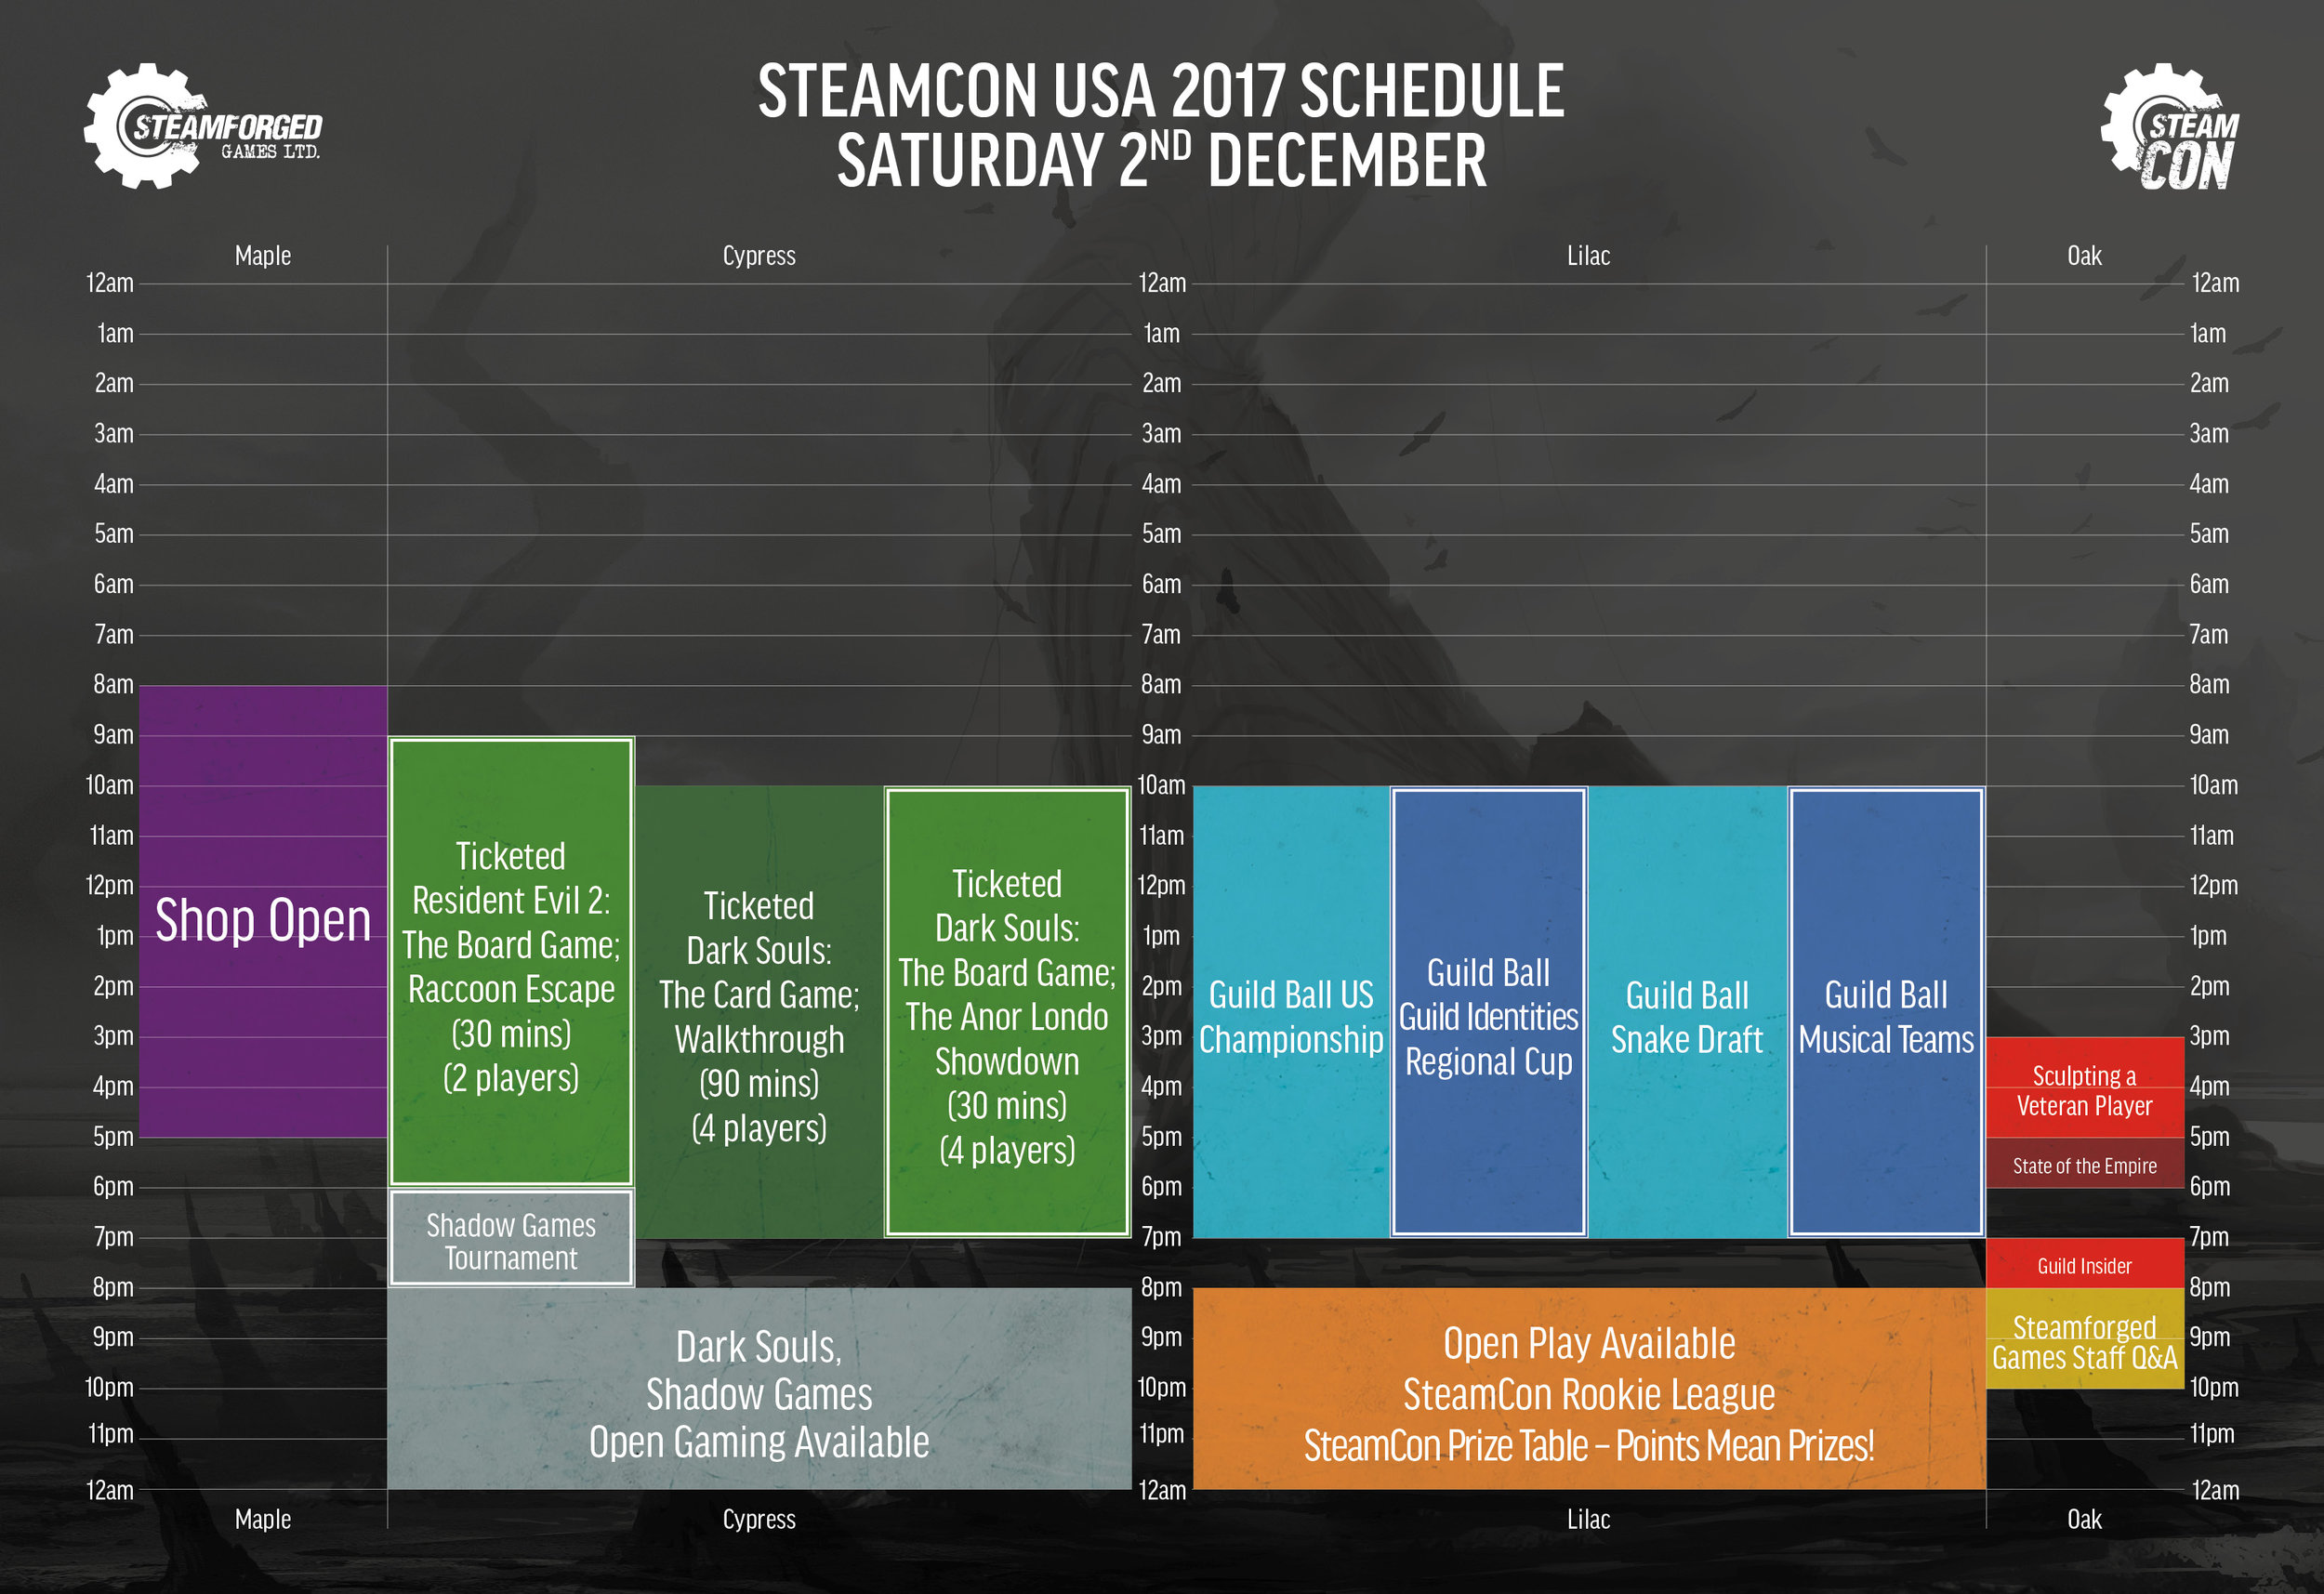 SC2017-Schedule-USA-Saturday.jpg